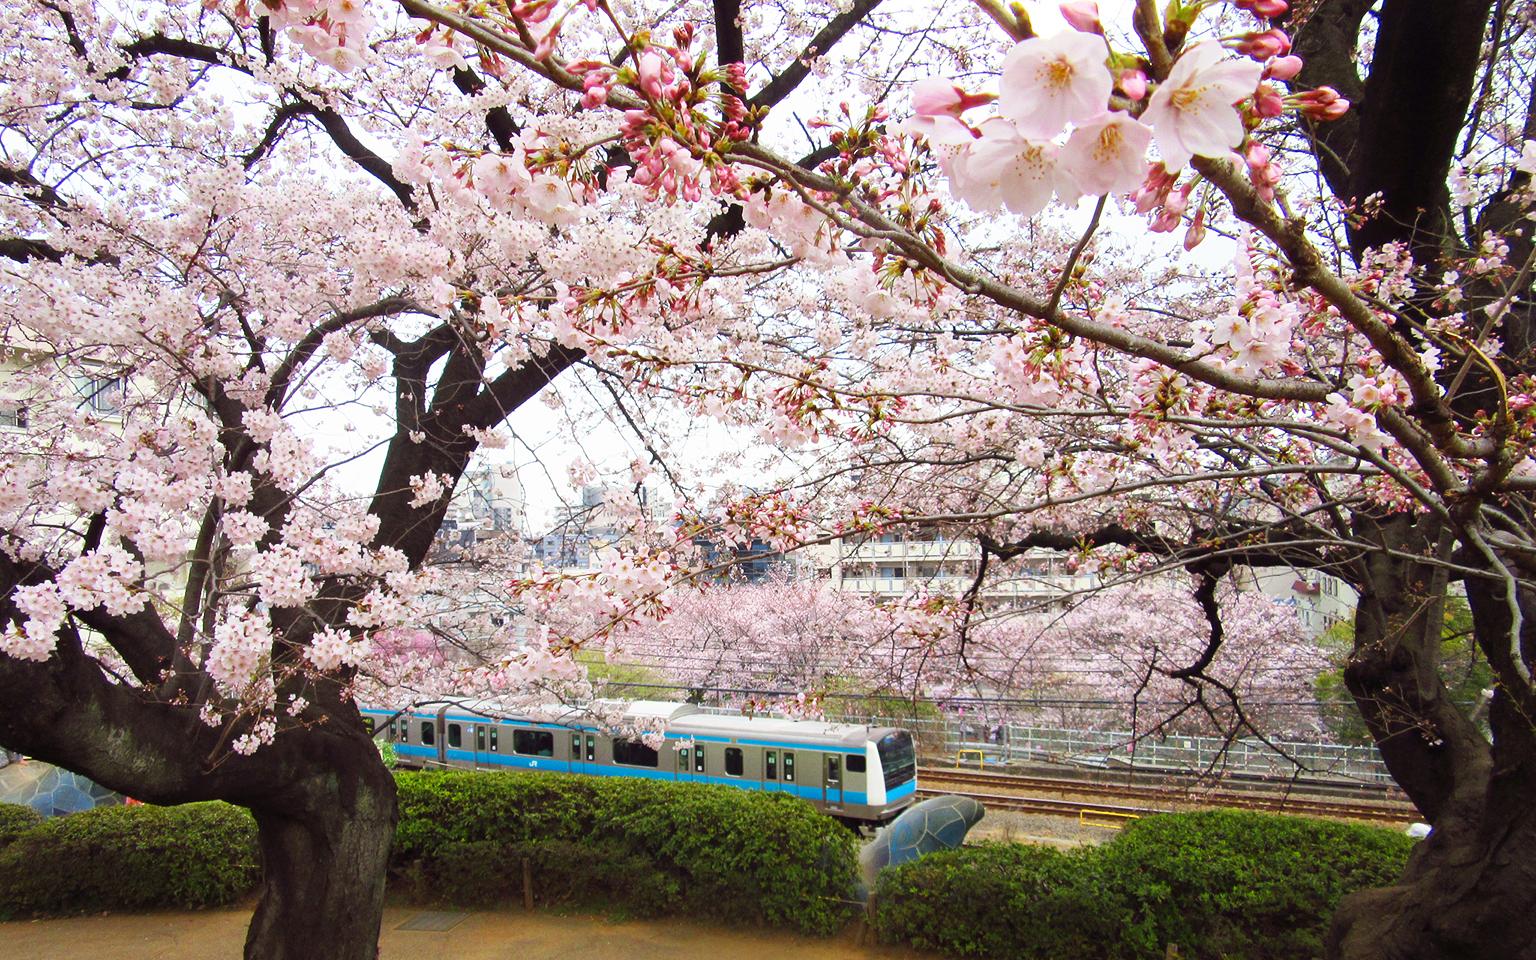 http://moritetsu.info/train/img/IMG_4285sssss-oomori-kaizuka.jpg